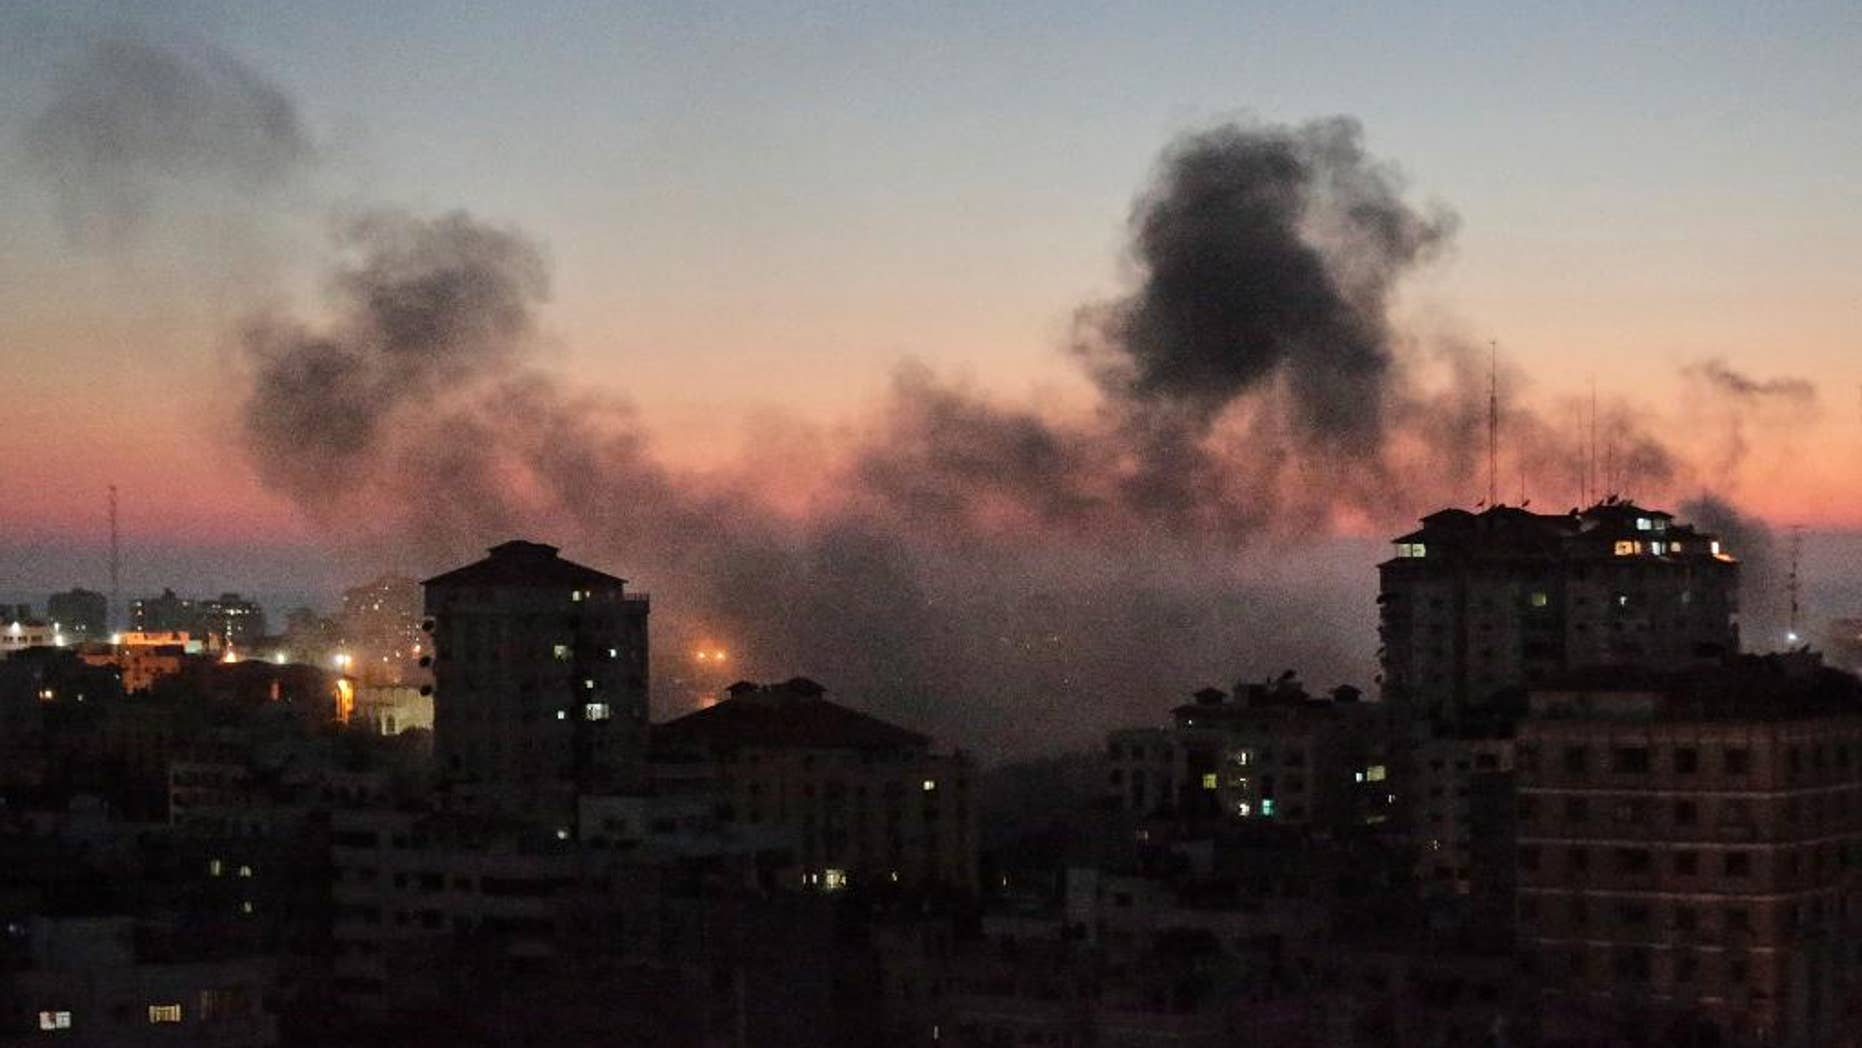 Smoke from fires caused by Israeli strikes, rises over Gaza City, Sunday, Aug. 10, 2014. (AP Photo/Lefteris Pitarakis)